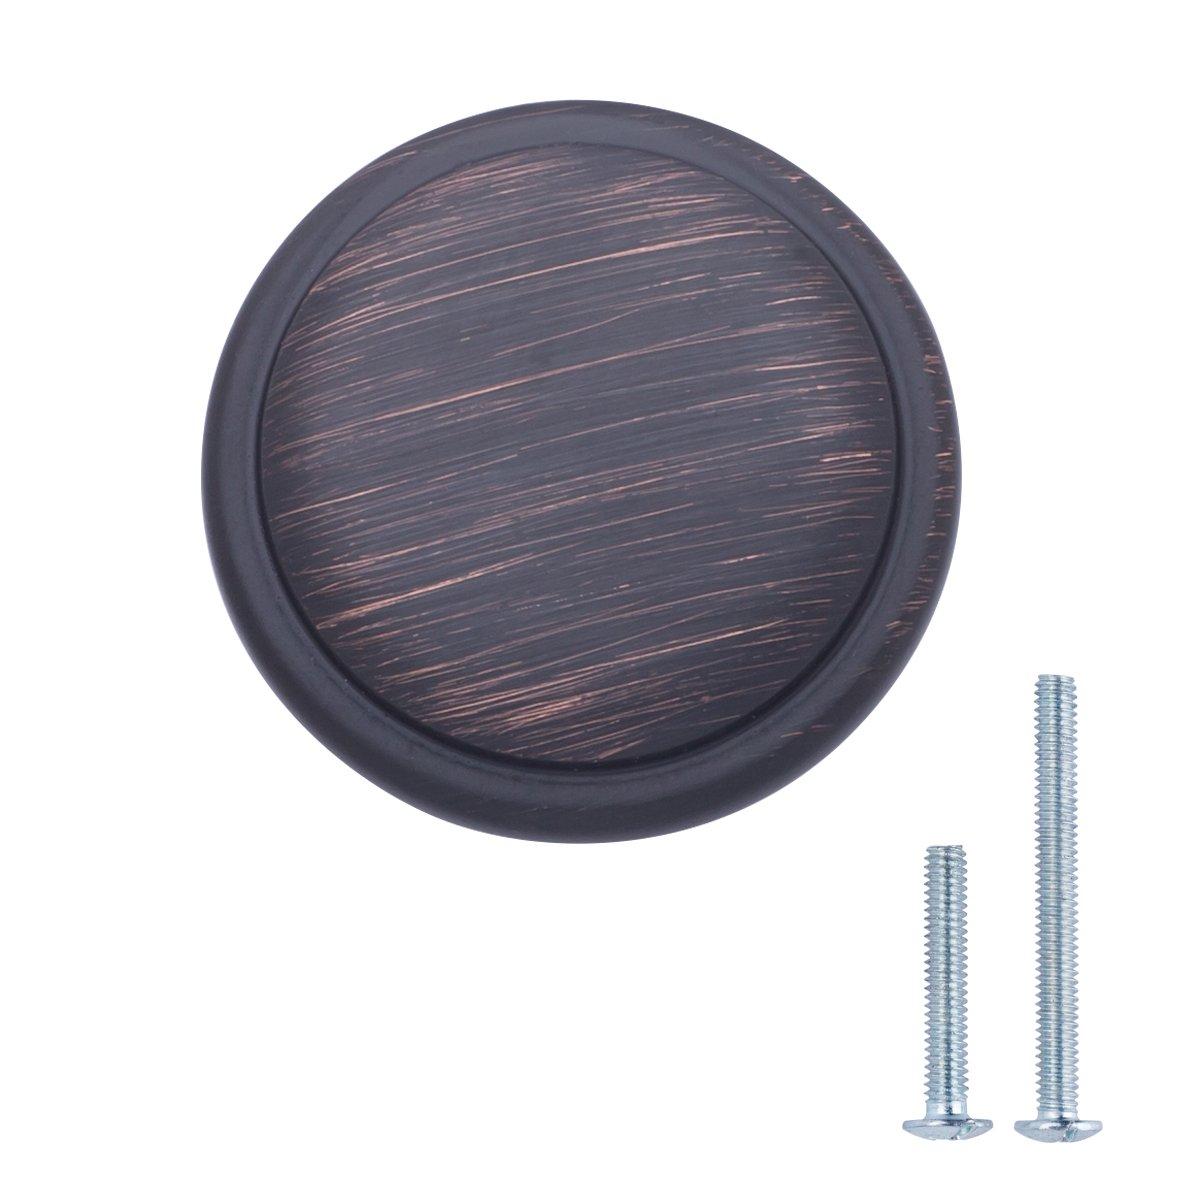 AmazonBasics Button Mushroom Cabinet Knob, 1.25'' Diameter, Oil Rubbed Bronze, 25-Pack